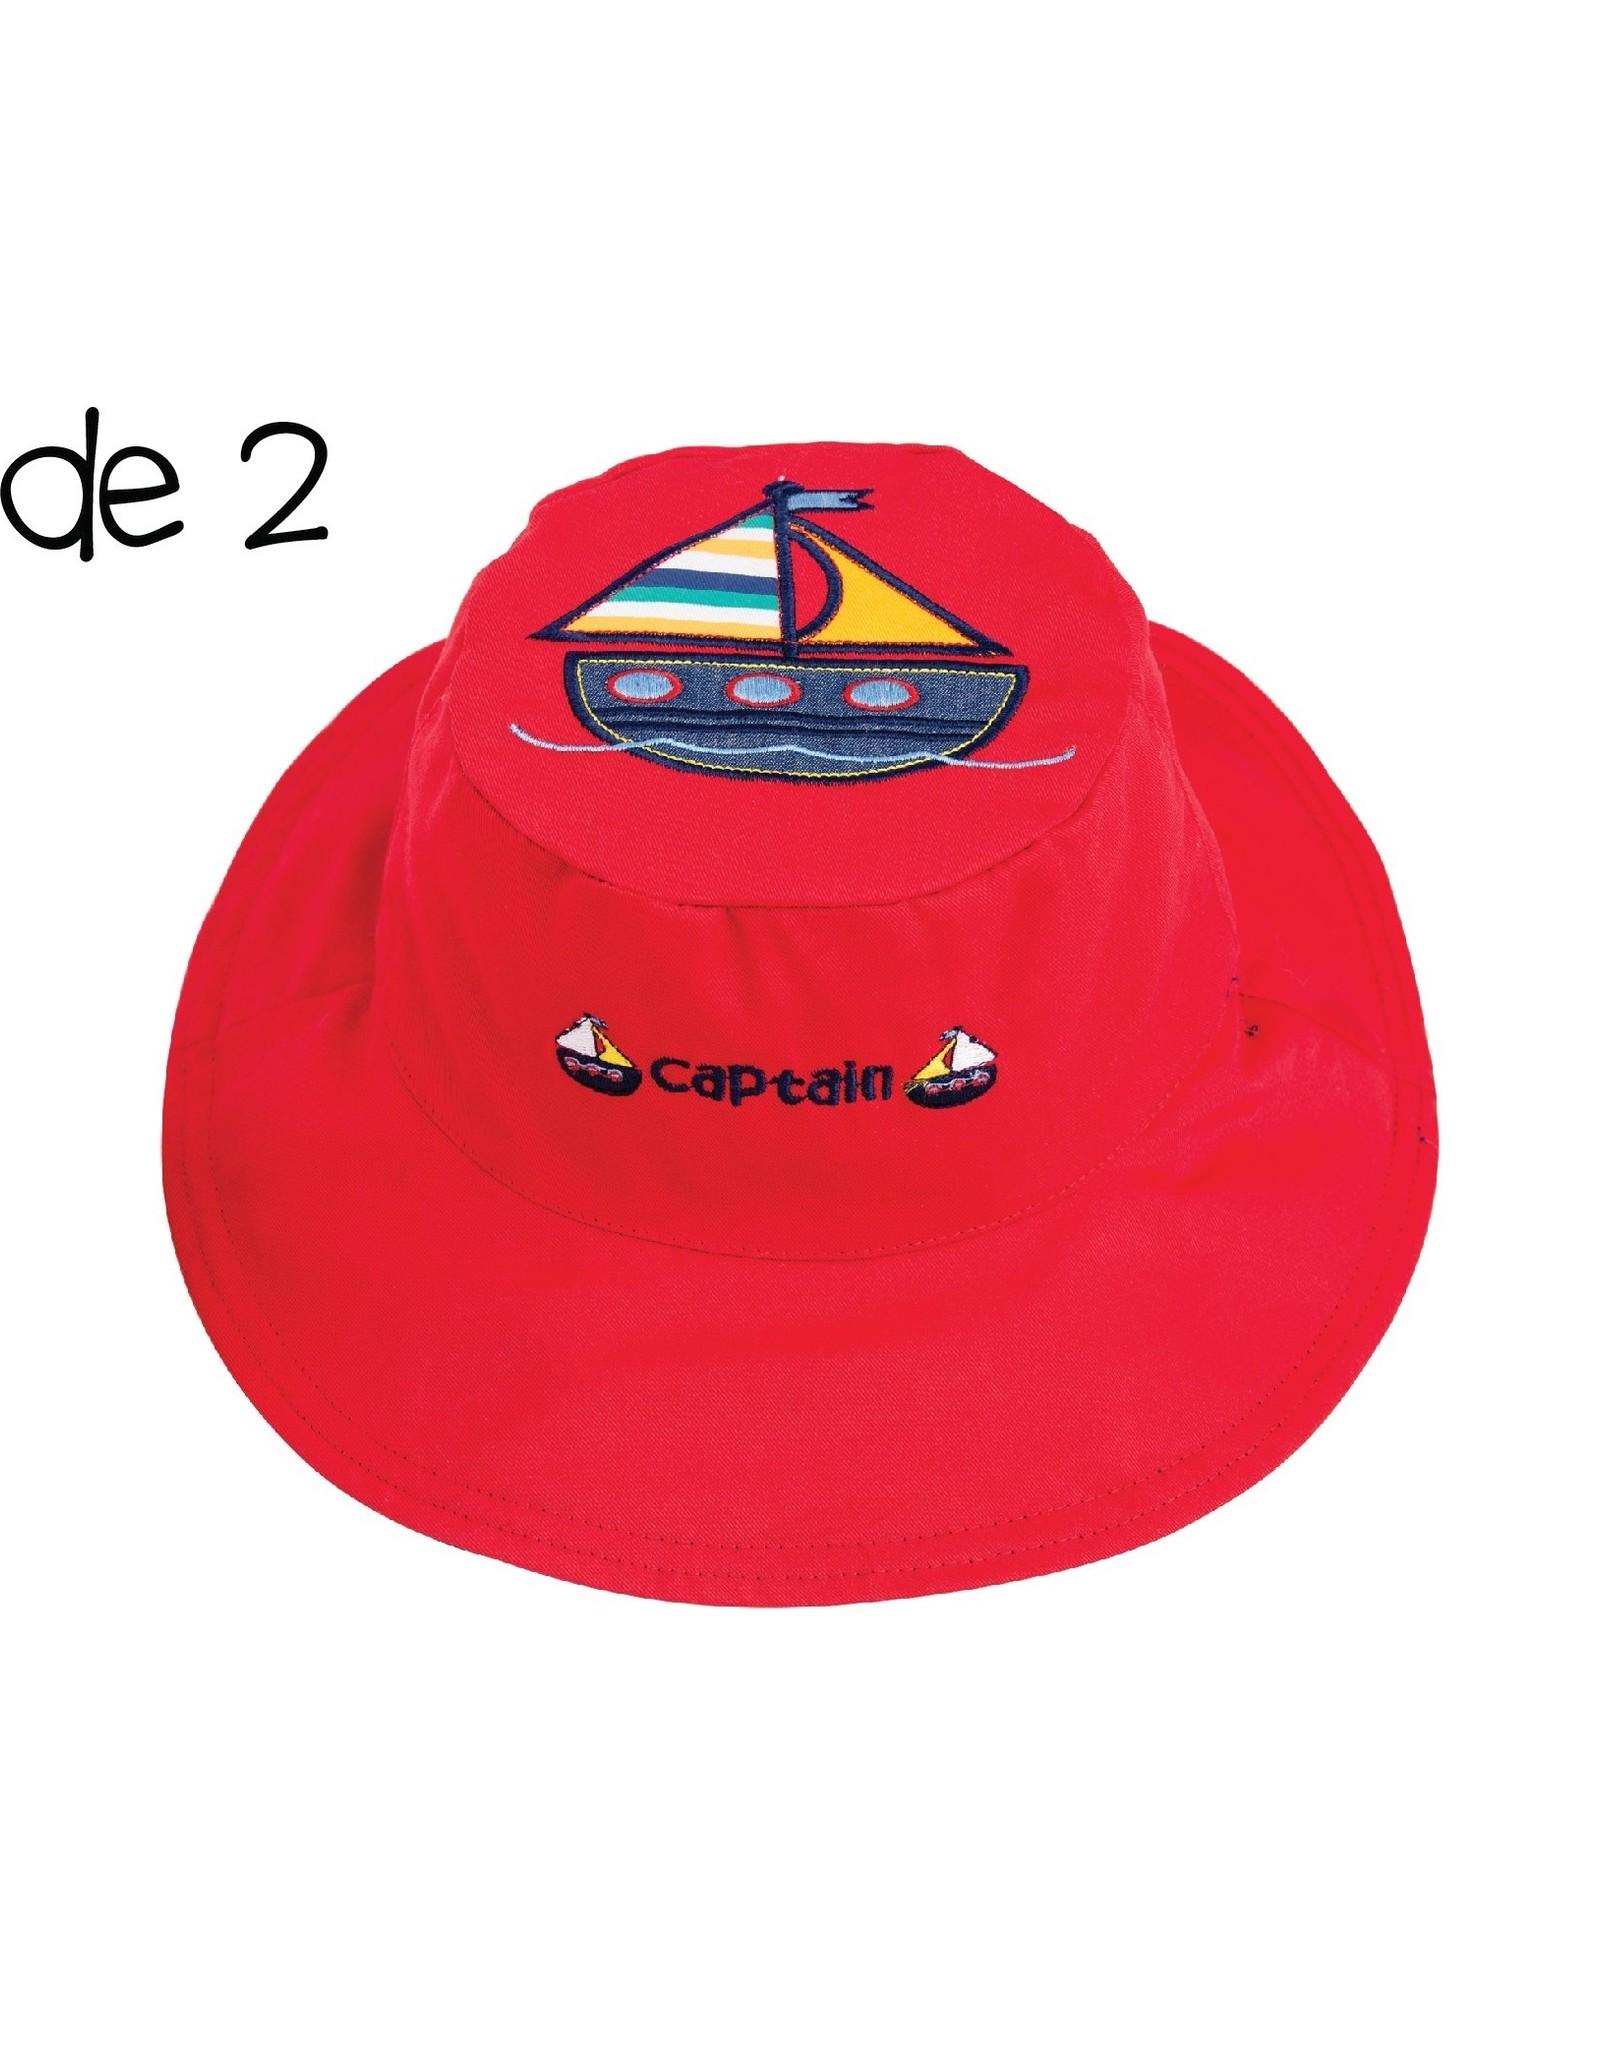 Sun Hat 2-4 yrs : Anchor/Sailboat (reversible)